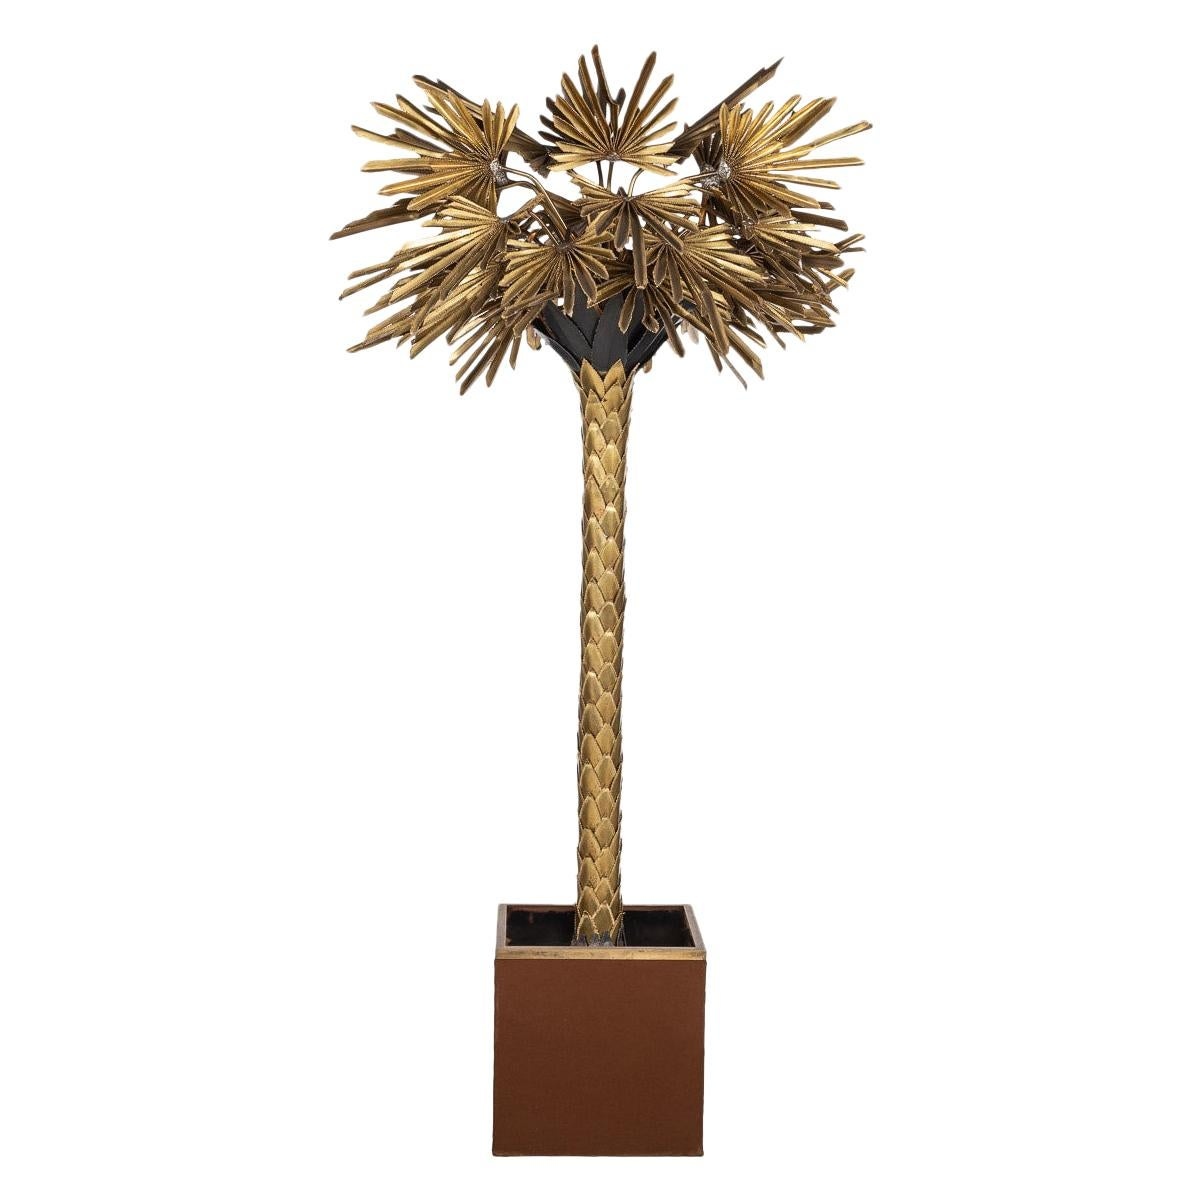 20th Century Palm Tree Floor Lamp by Maison Jansen, France, circa 1970